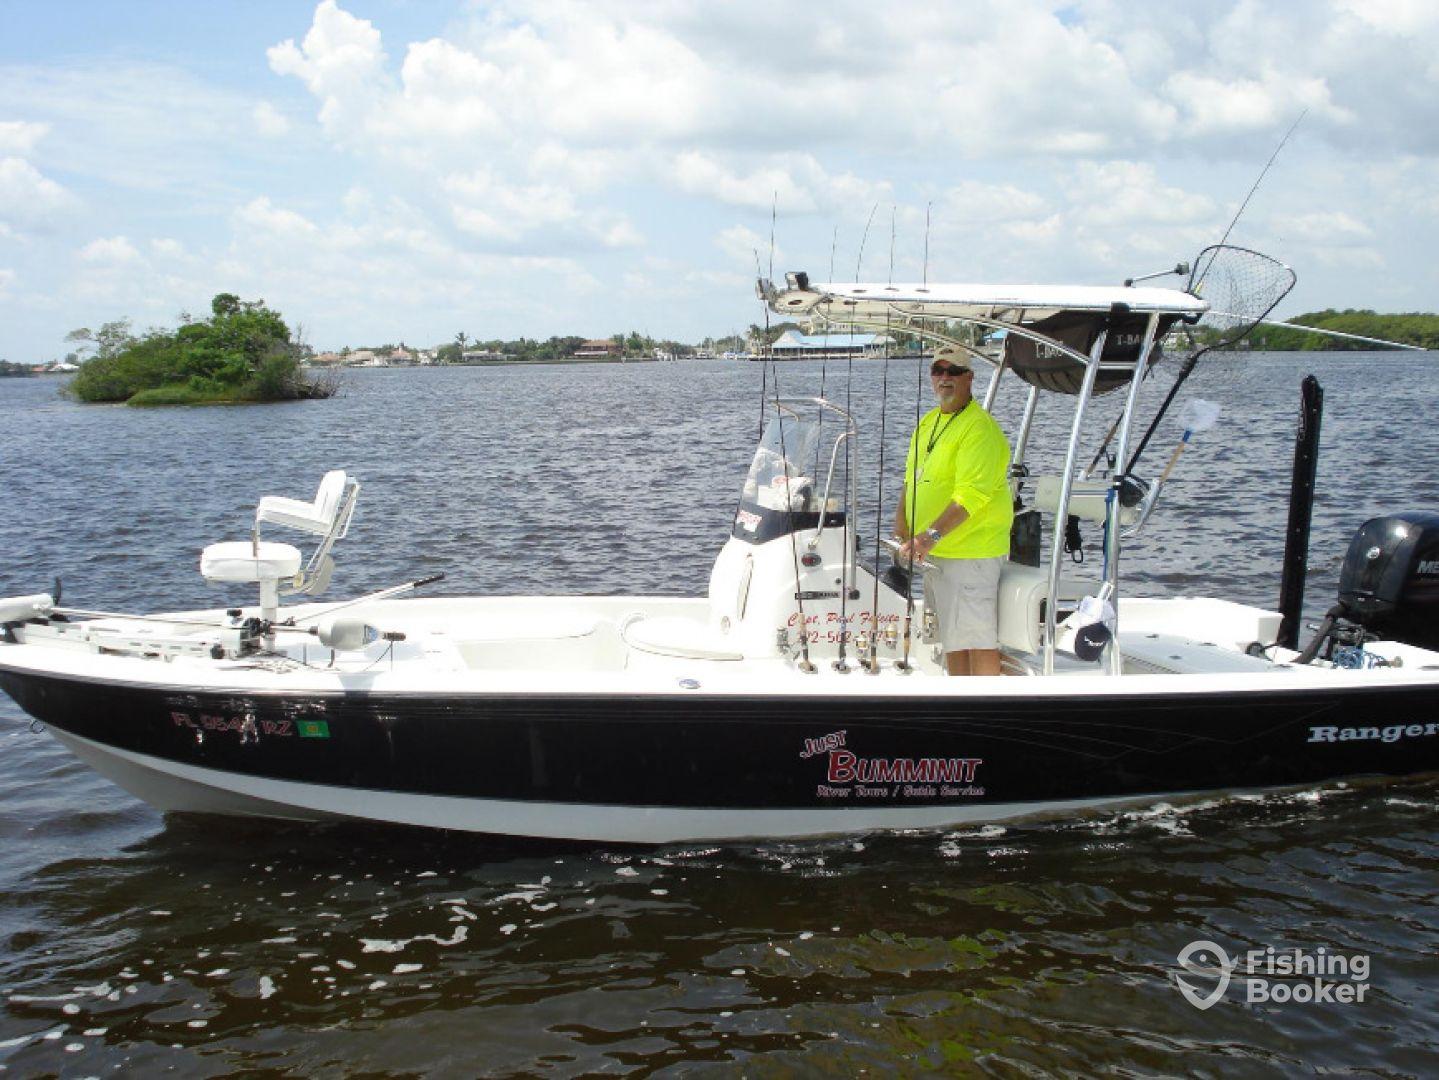 Just bumminit ranger boat vero beach fl fishingbooker for Vero beach fishing charters